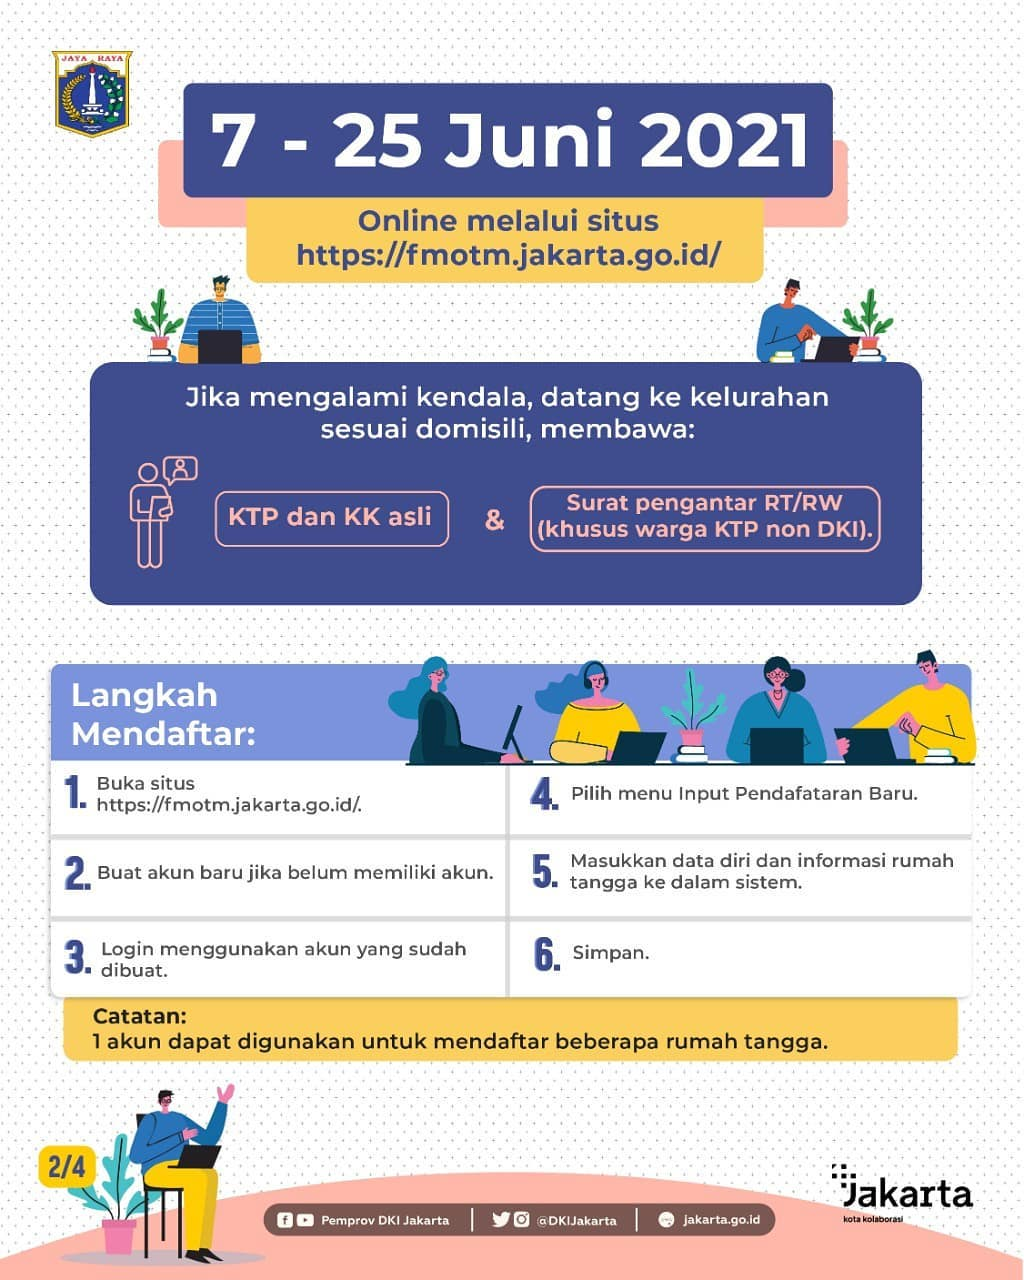 cara daftar program fmotm 2021 dki jakarta untuk warga miskin agar dapat bansos dtks di fmotm.jakarta.go.id